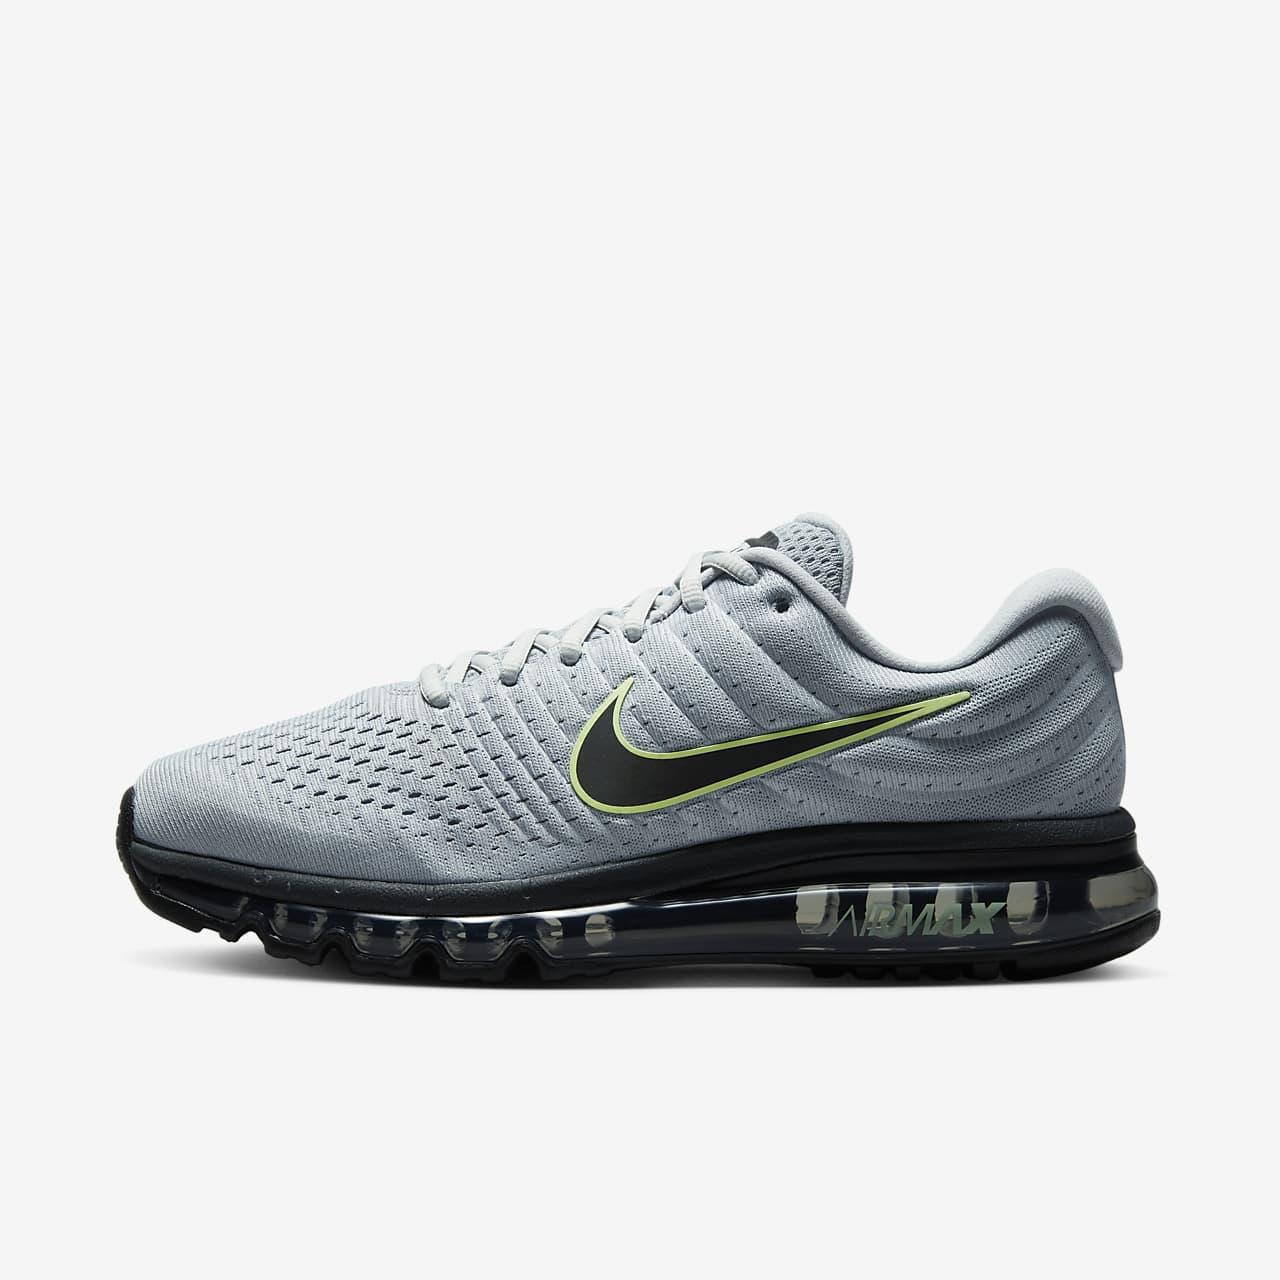 6d91487bcb Nike Air Max 2017 herresko. Nike.com NO